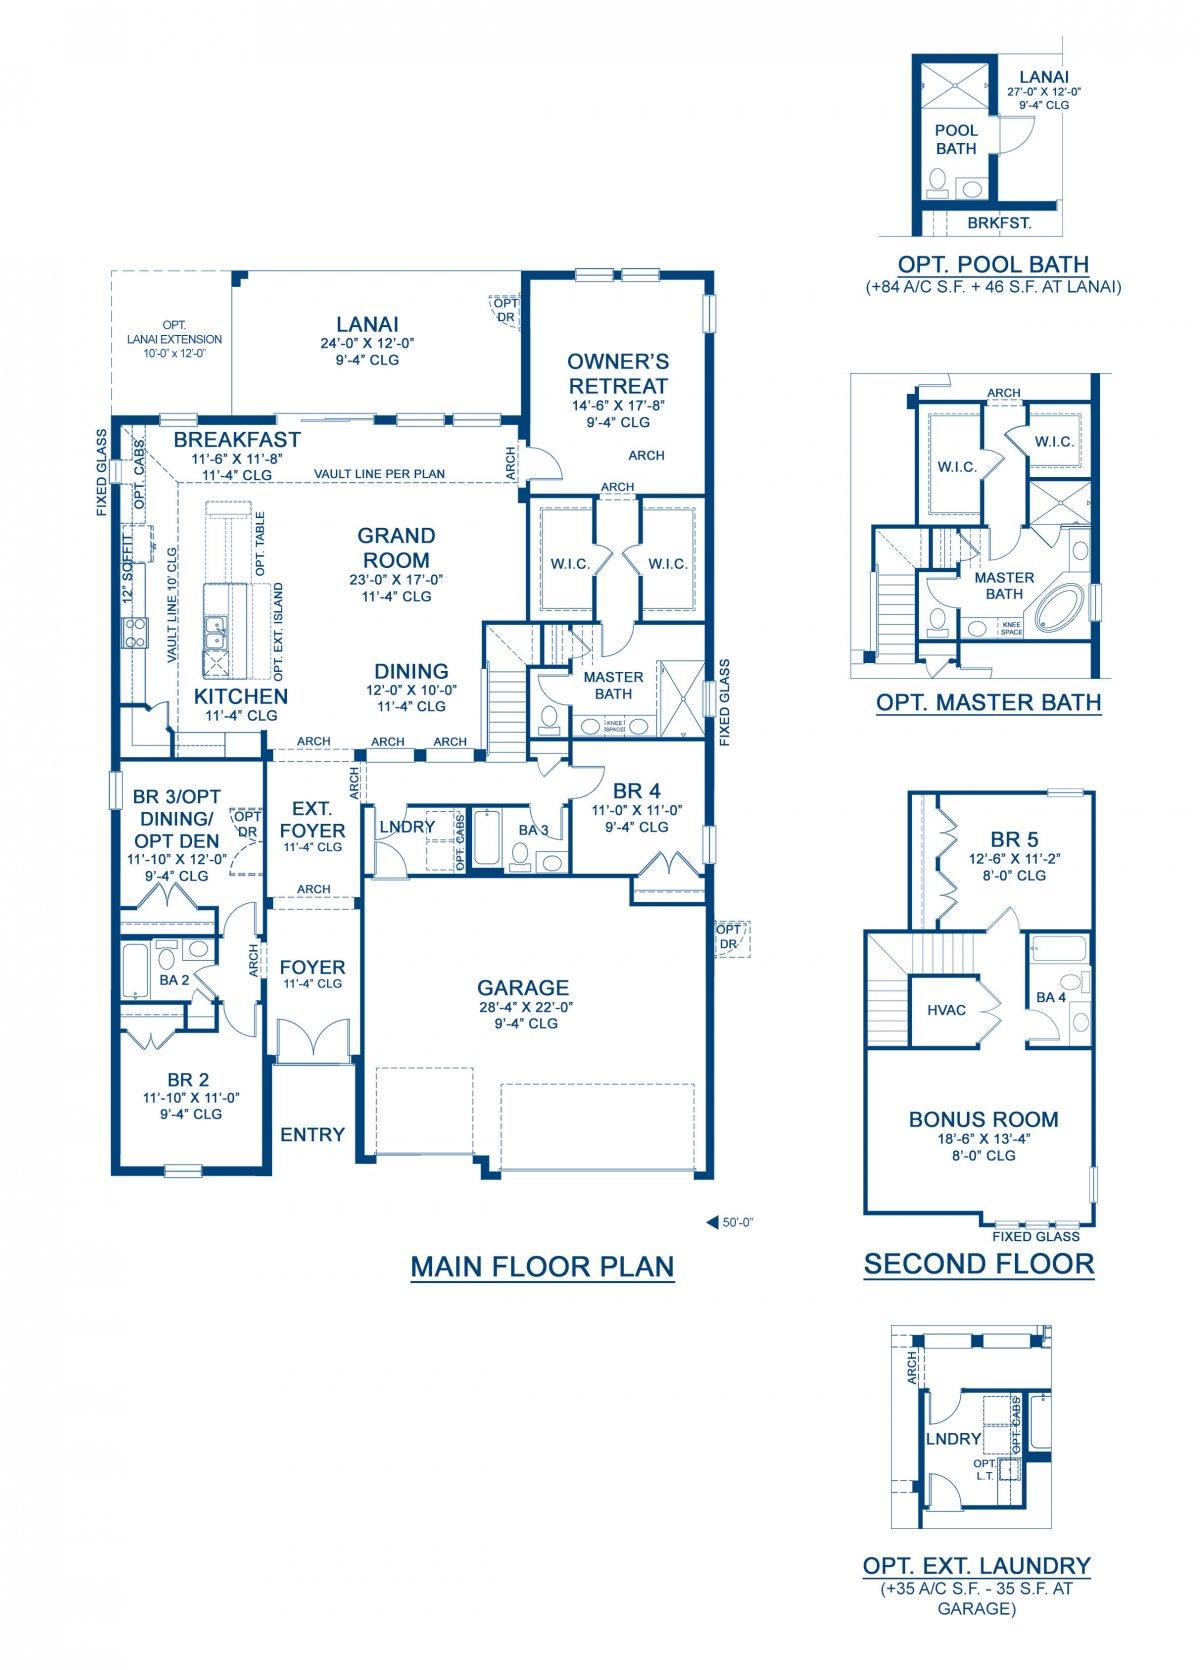 New Home Floorplans In Odessa Bayshore Ii Detail Floorplan